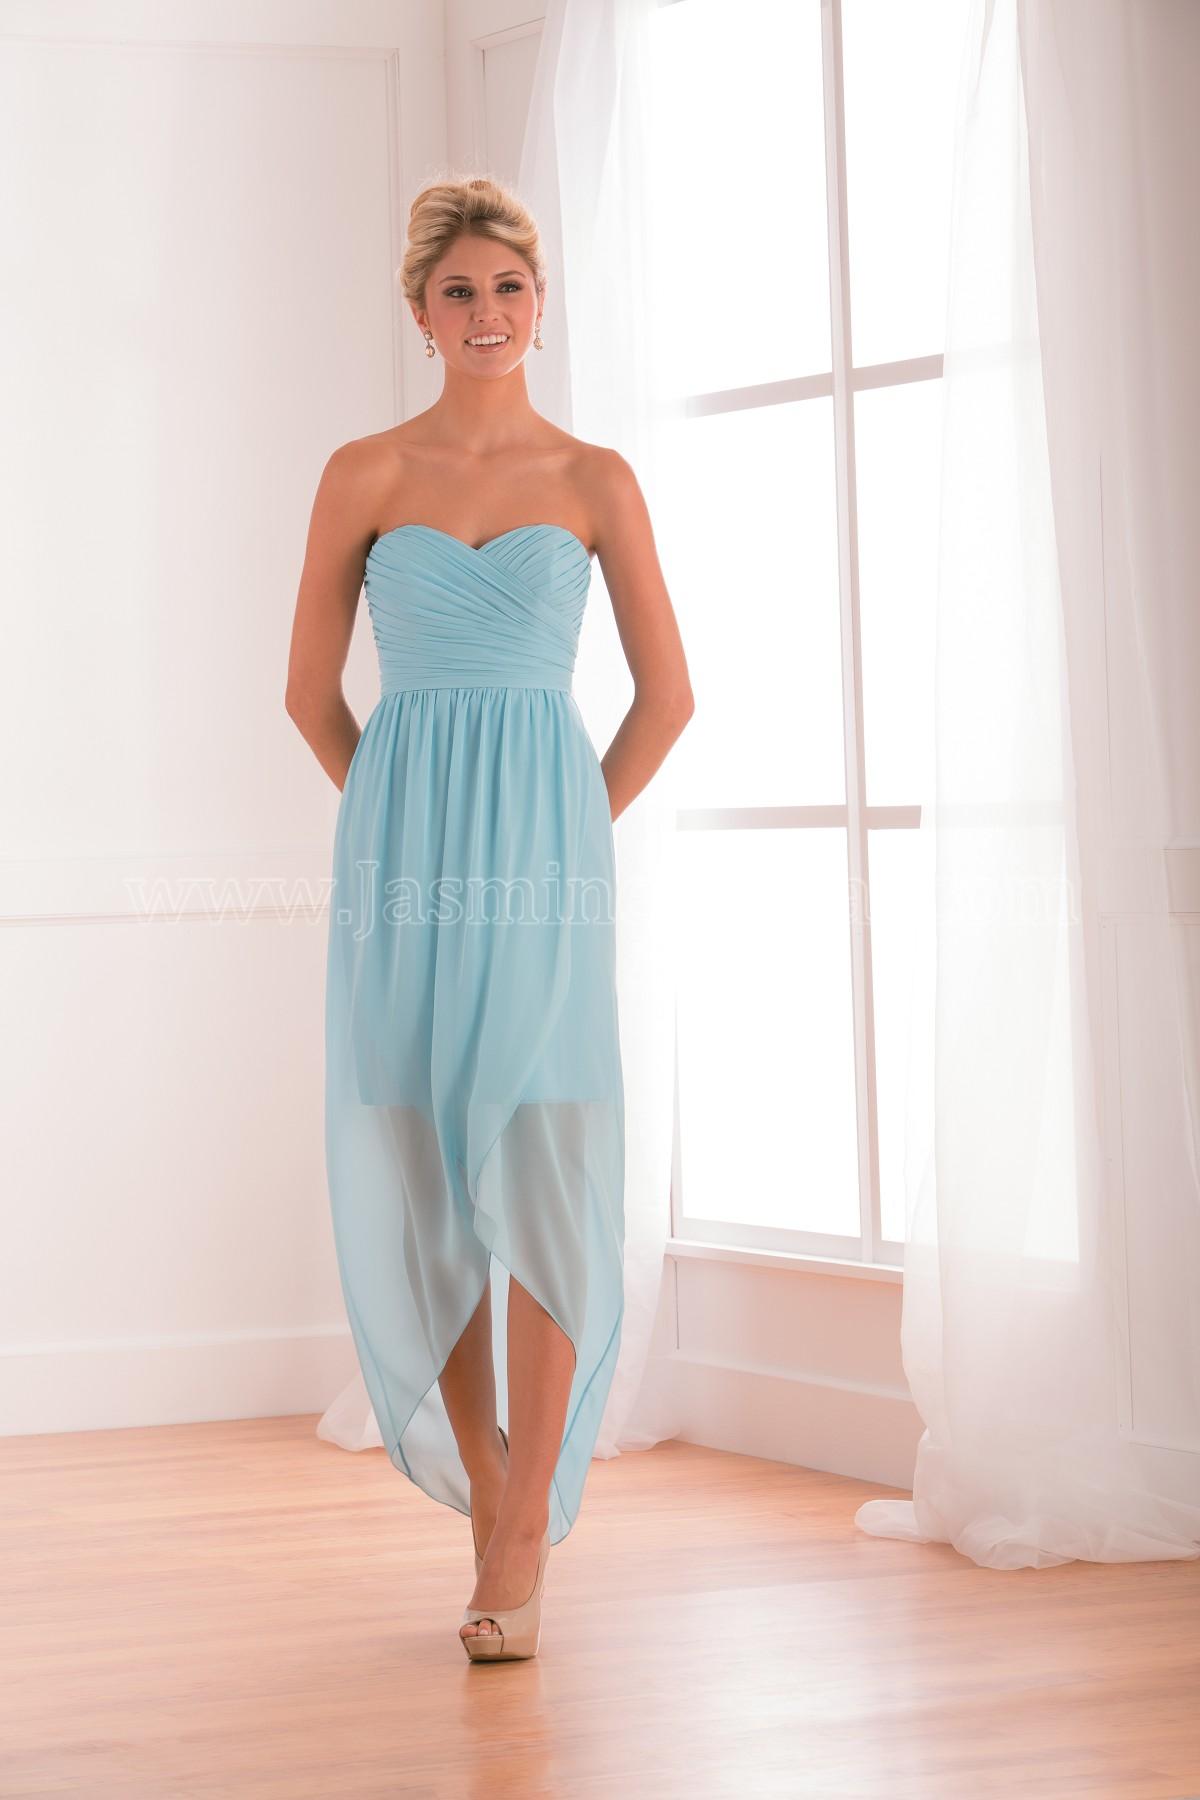 View Dress B2 SPRING 2015 B